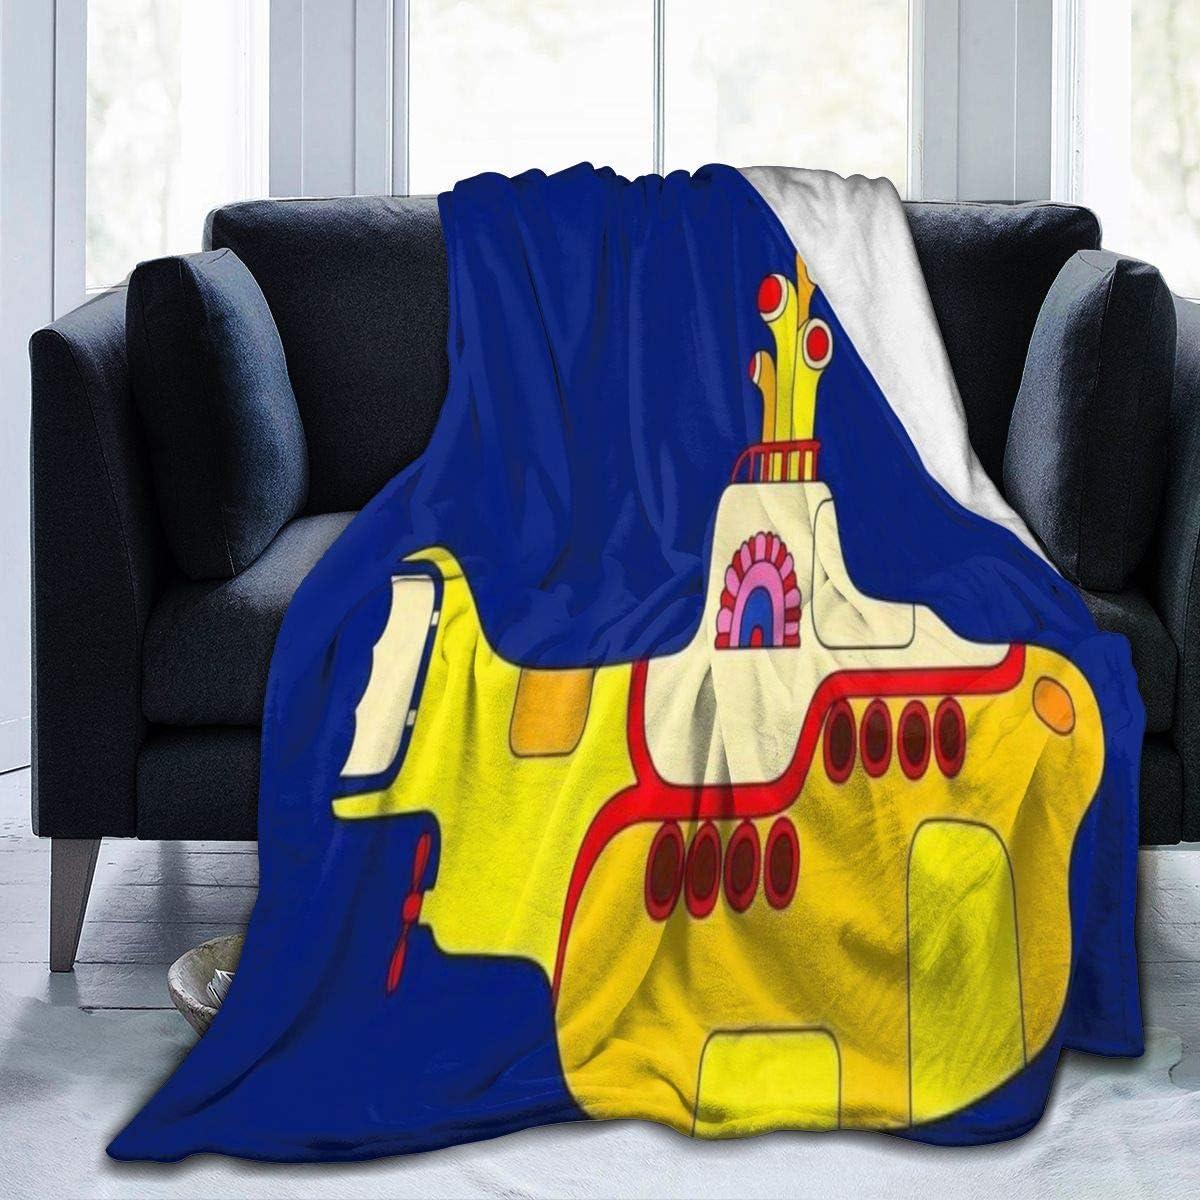 Beatles Yellow Submarine Blanket